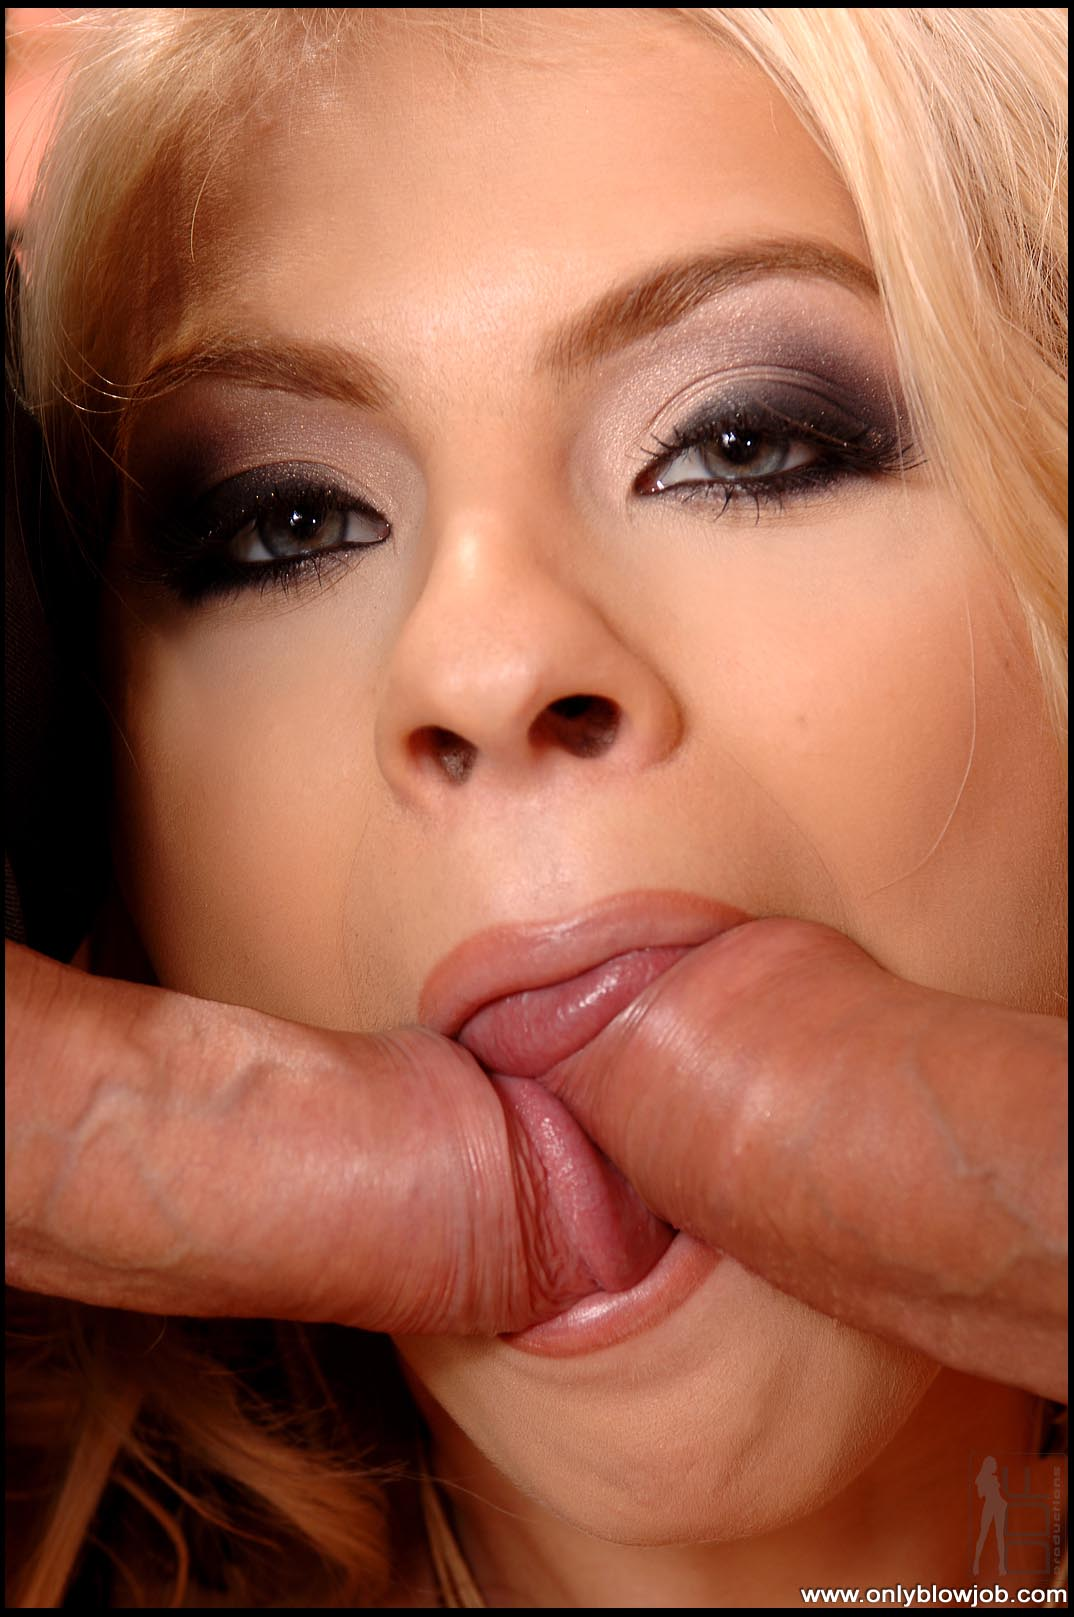 Blow job monica sweetheart